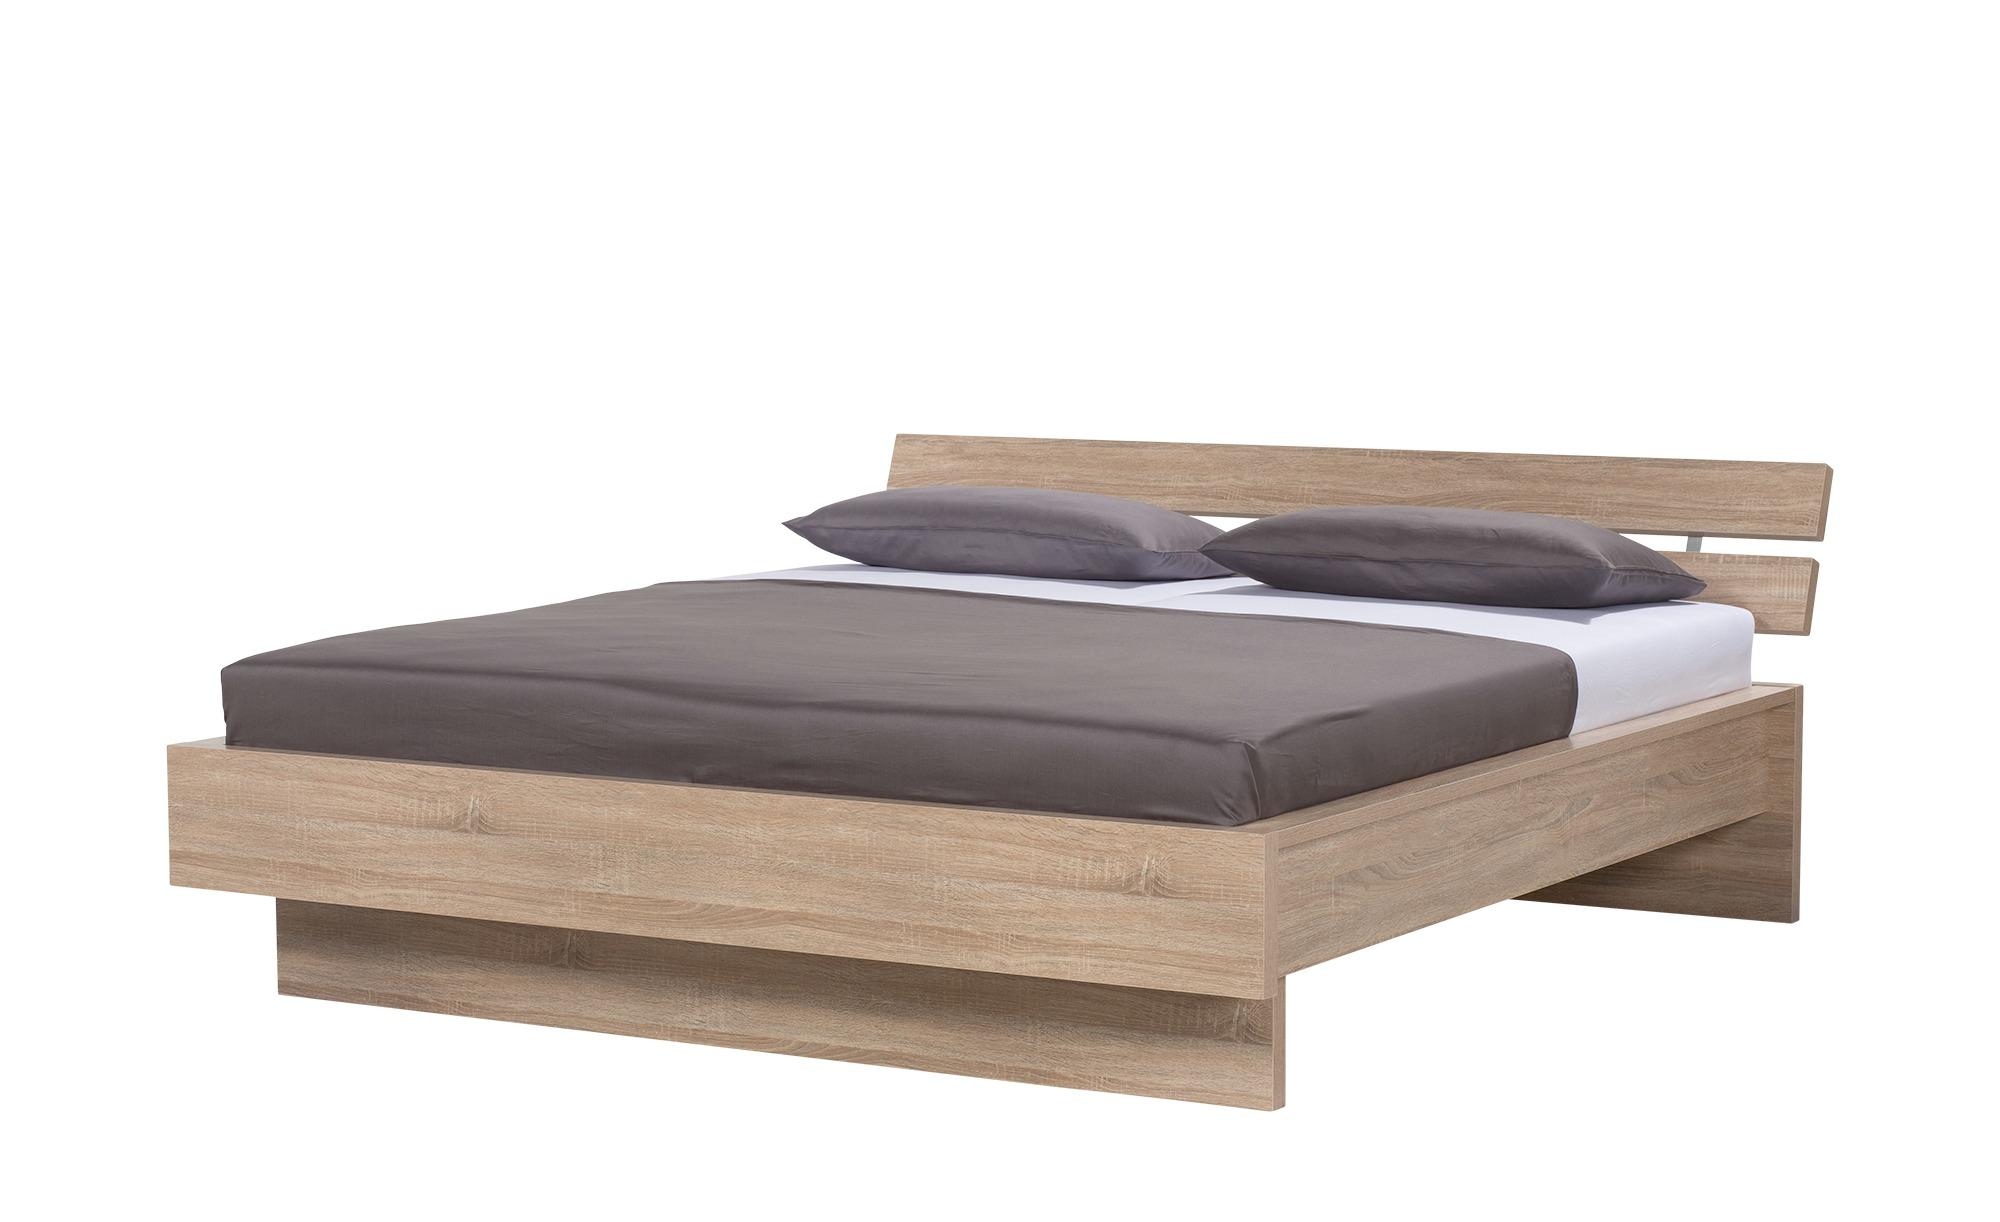 Bettgestell 180x200 Eiche Optik Dublin Holzfarben Maße Cm B 195 H 82 T 223 Betten Doppelbetten Höffner